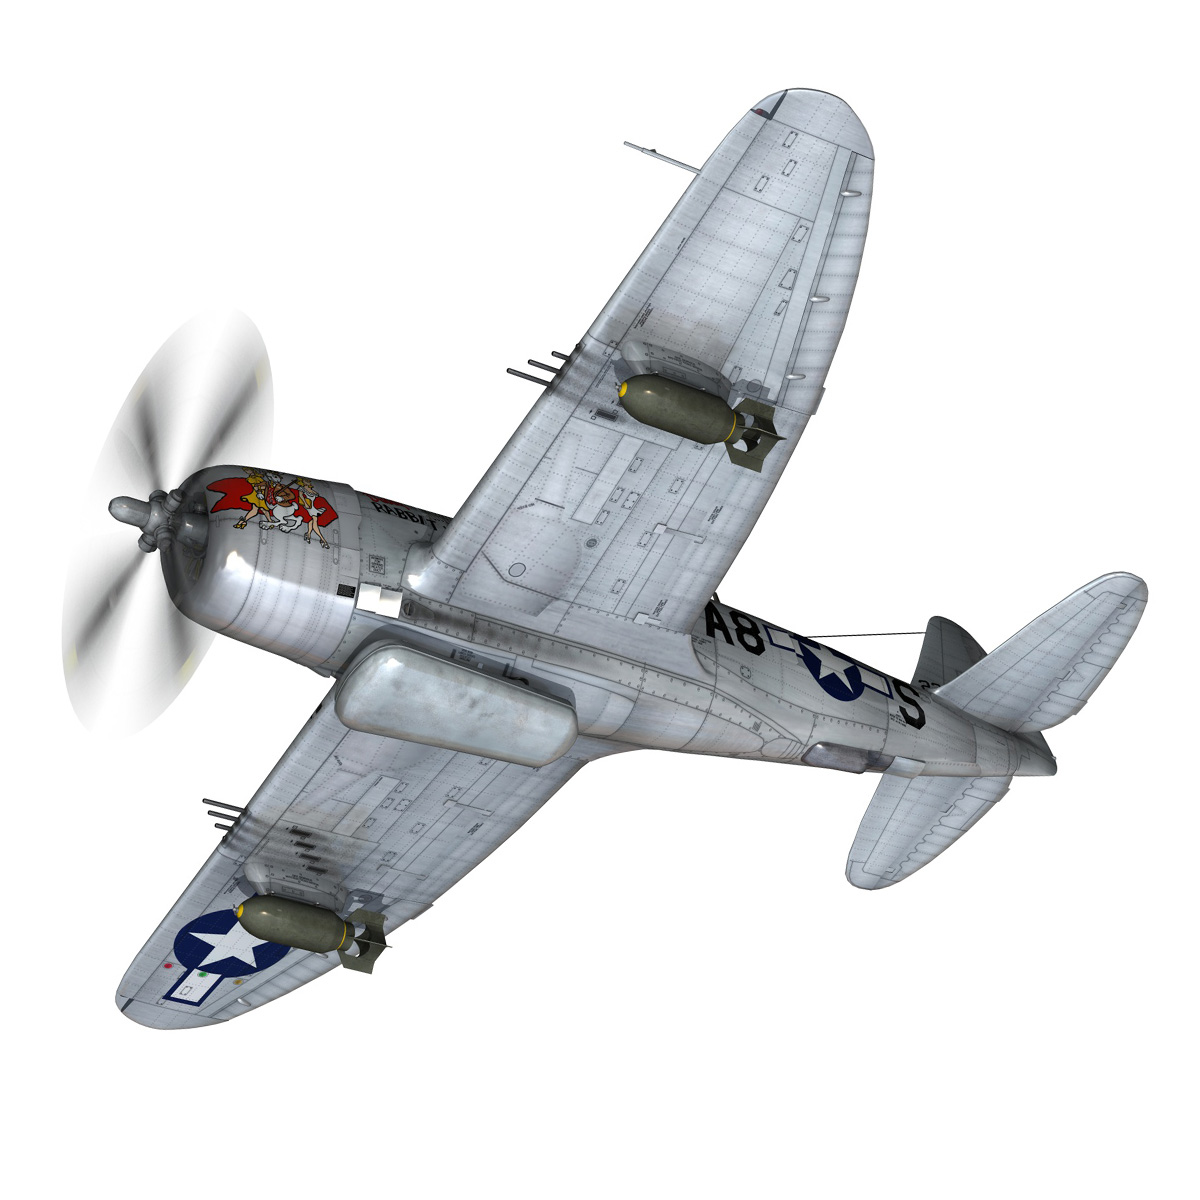 republic p-47 thunderbolt – daddy rabbit 3d model fbx c4d lwo obj 272690